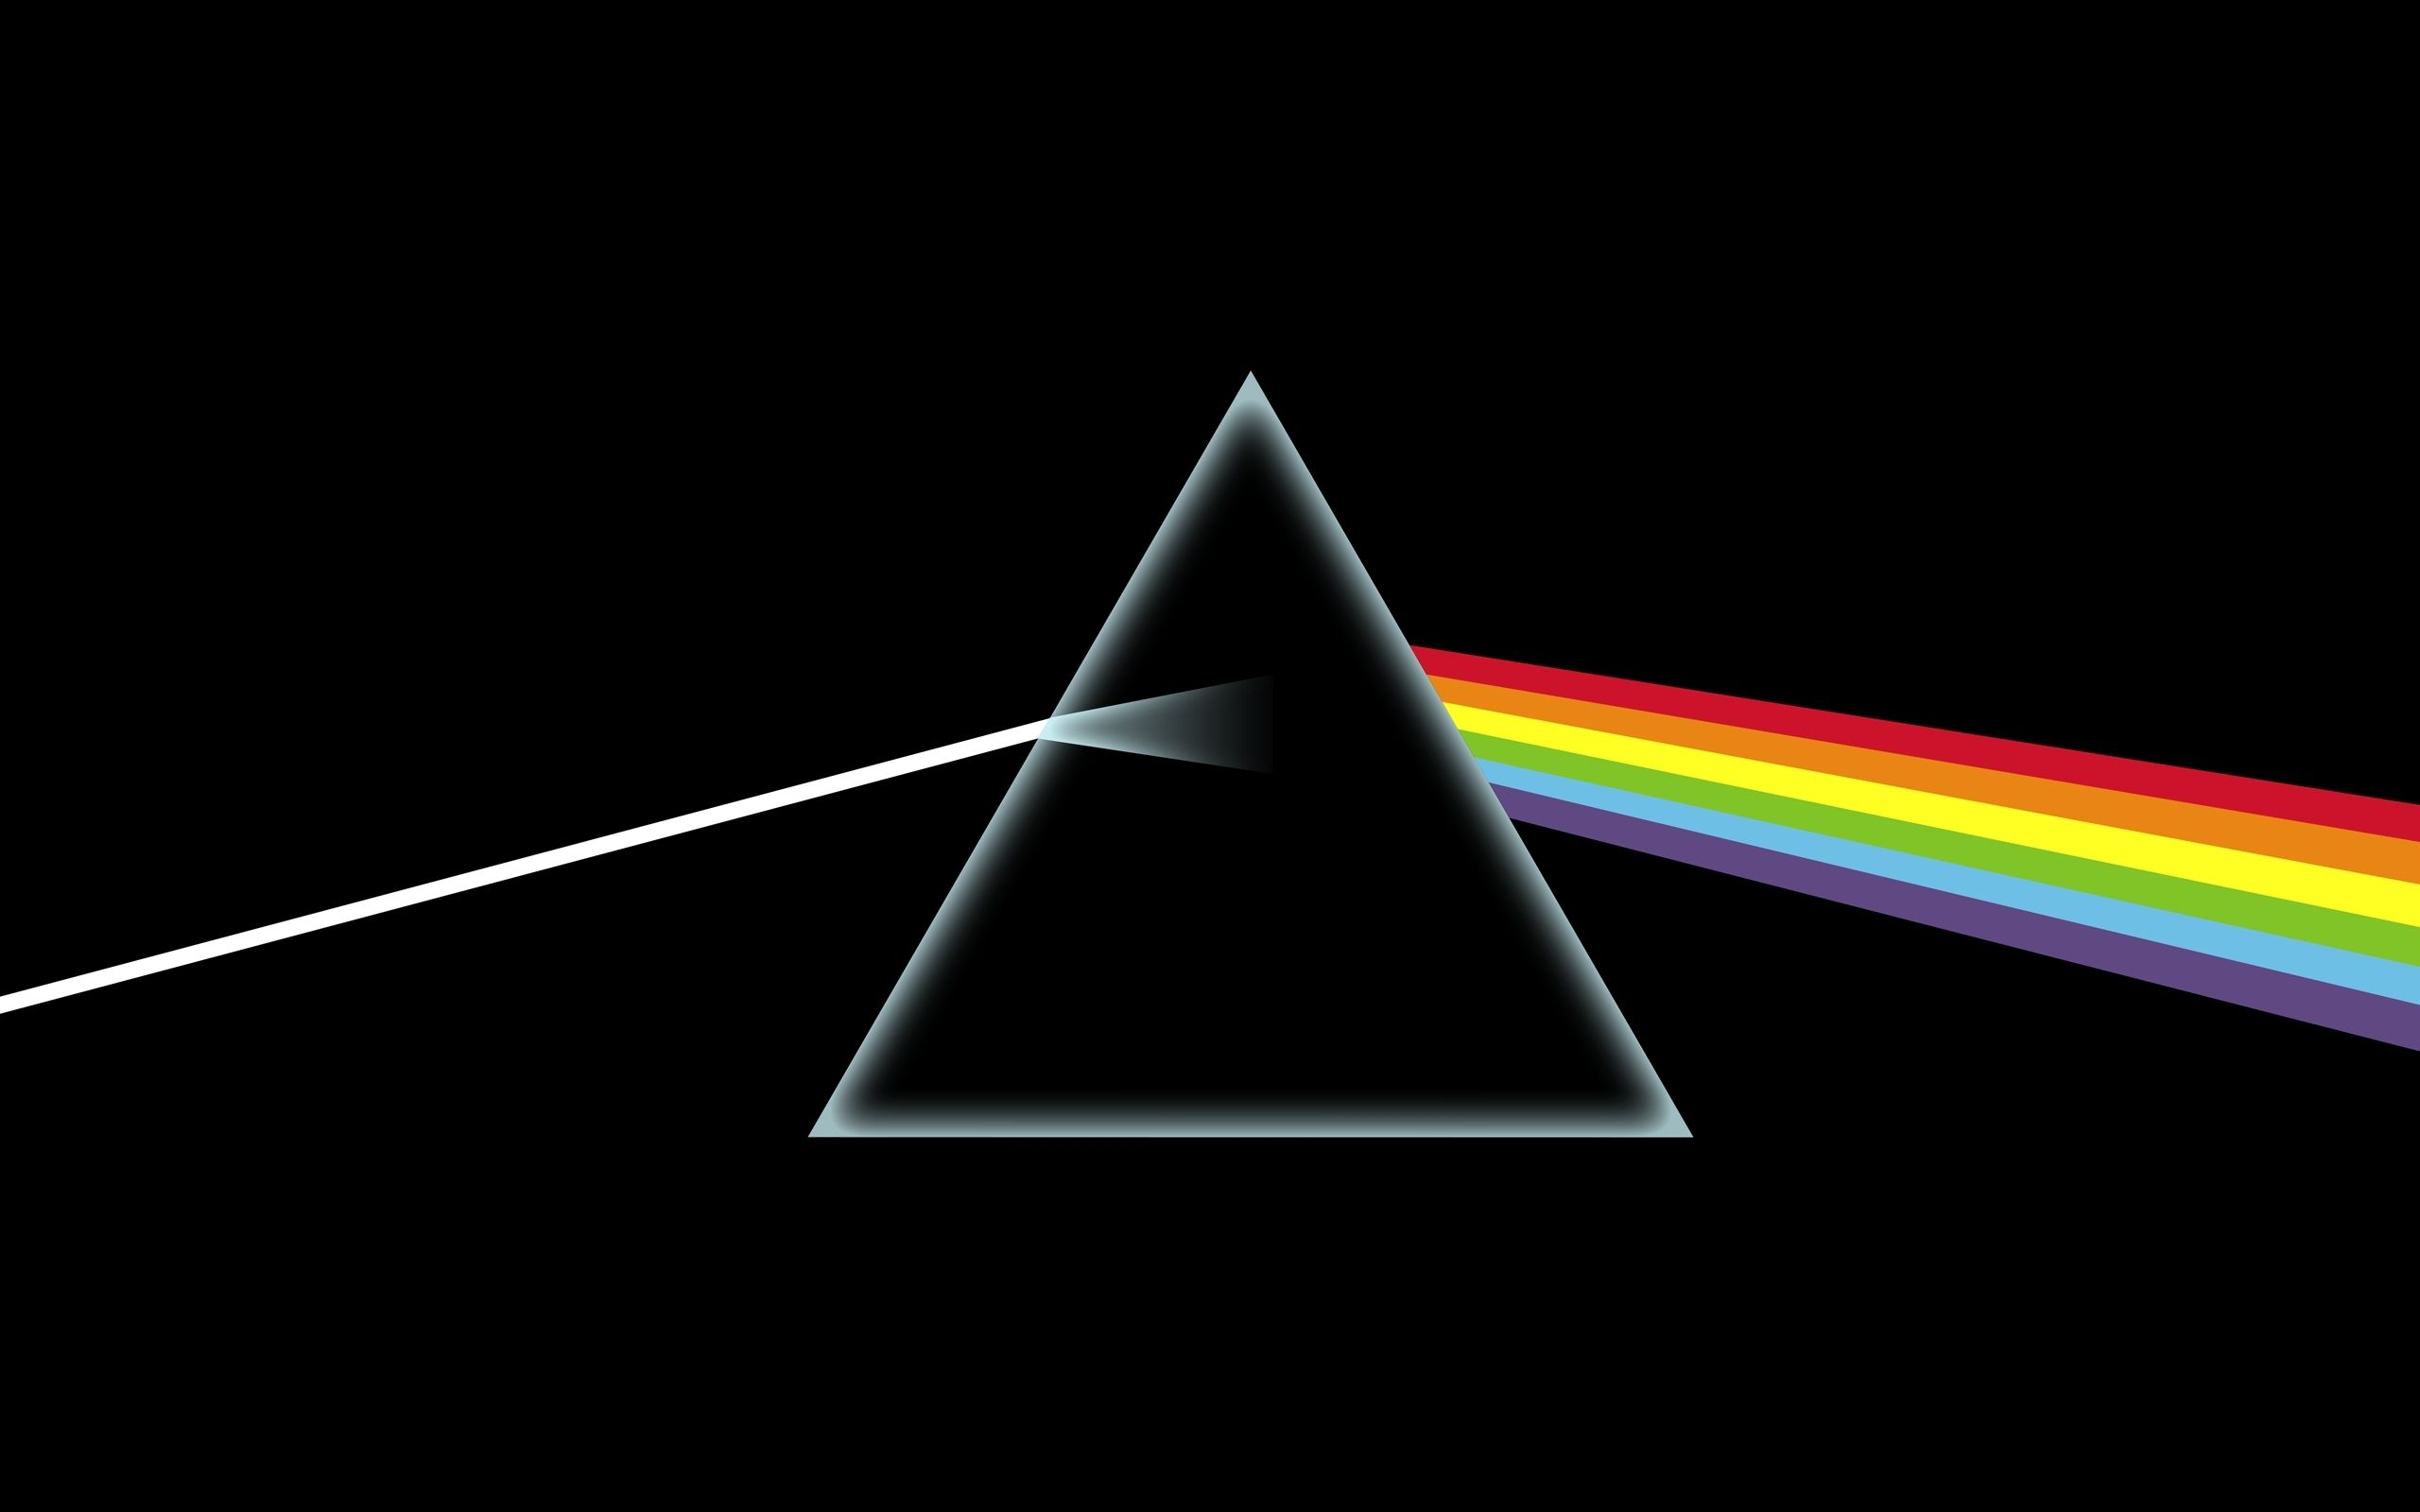 Minimalistic Pink Floyd Dark Side Of The Moon Band Triangle